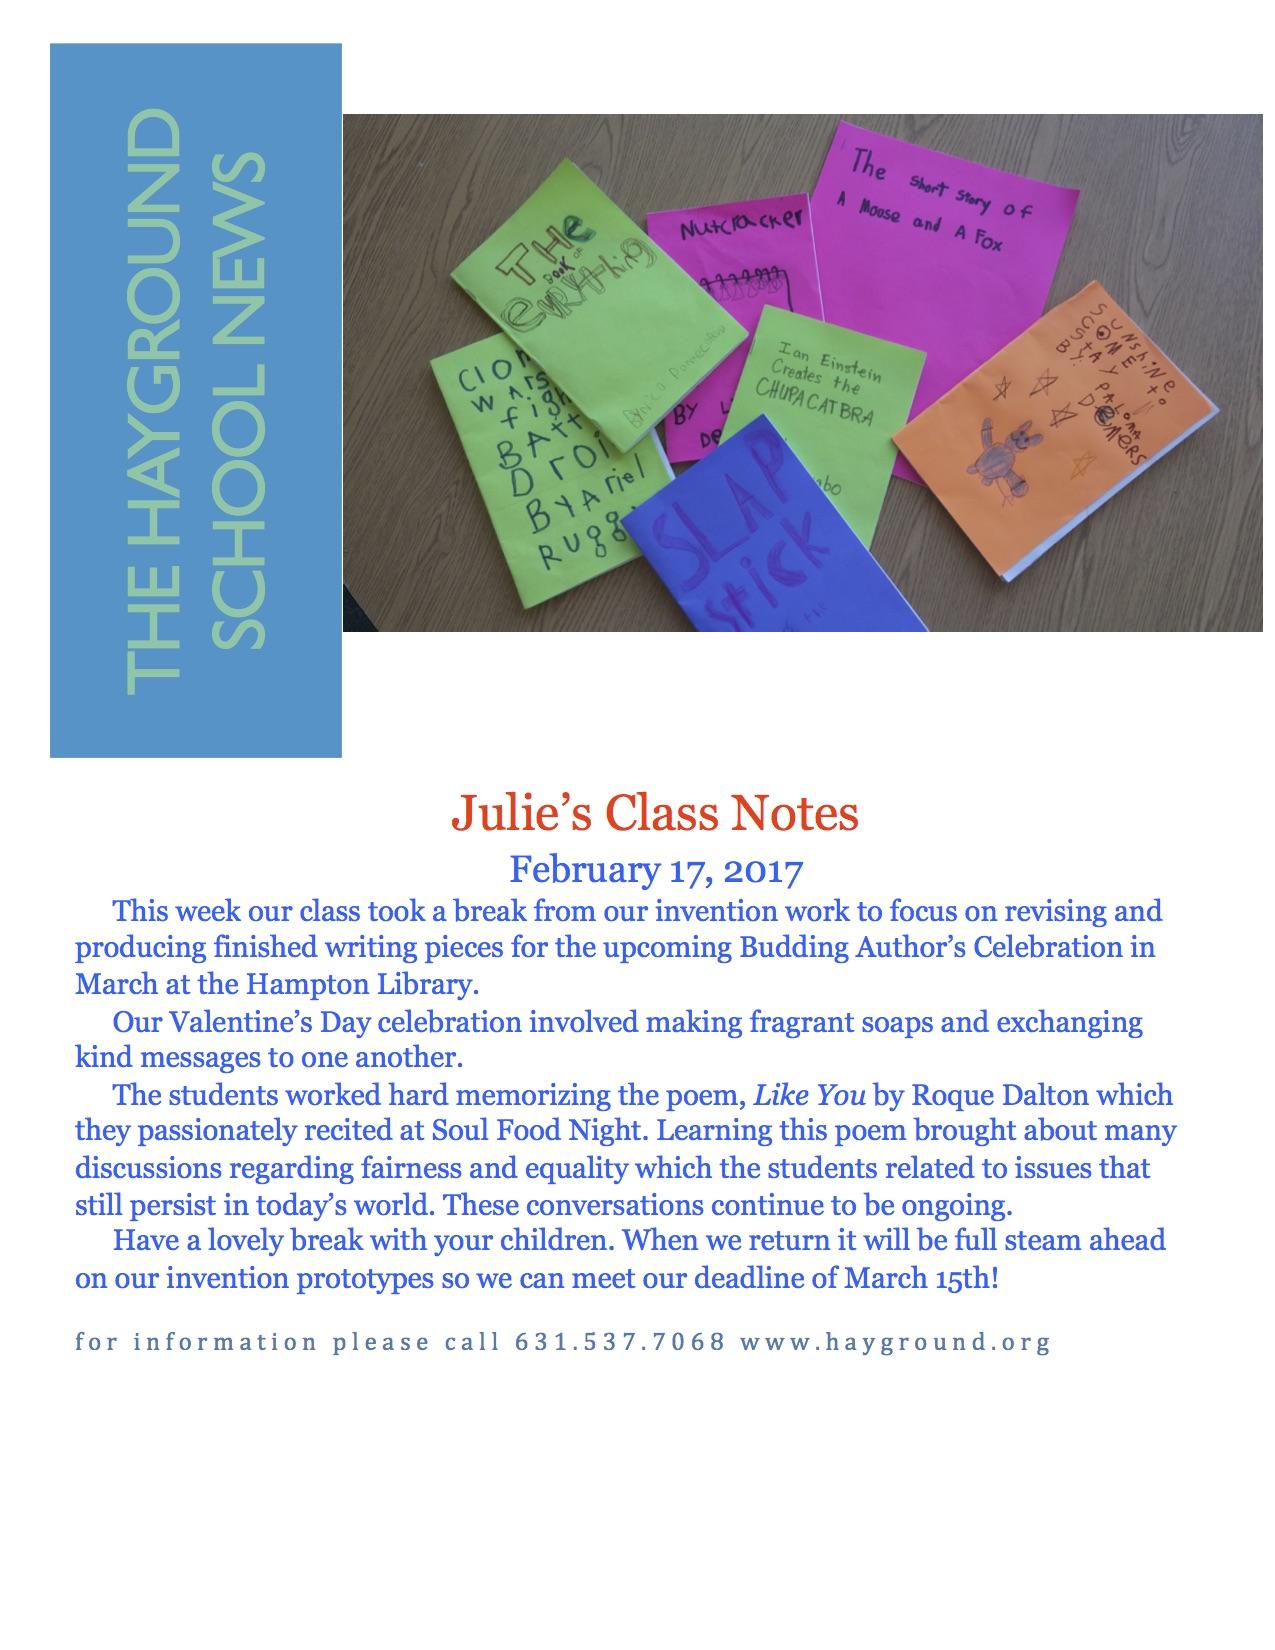 February 17 notes copy.jpg